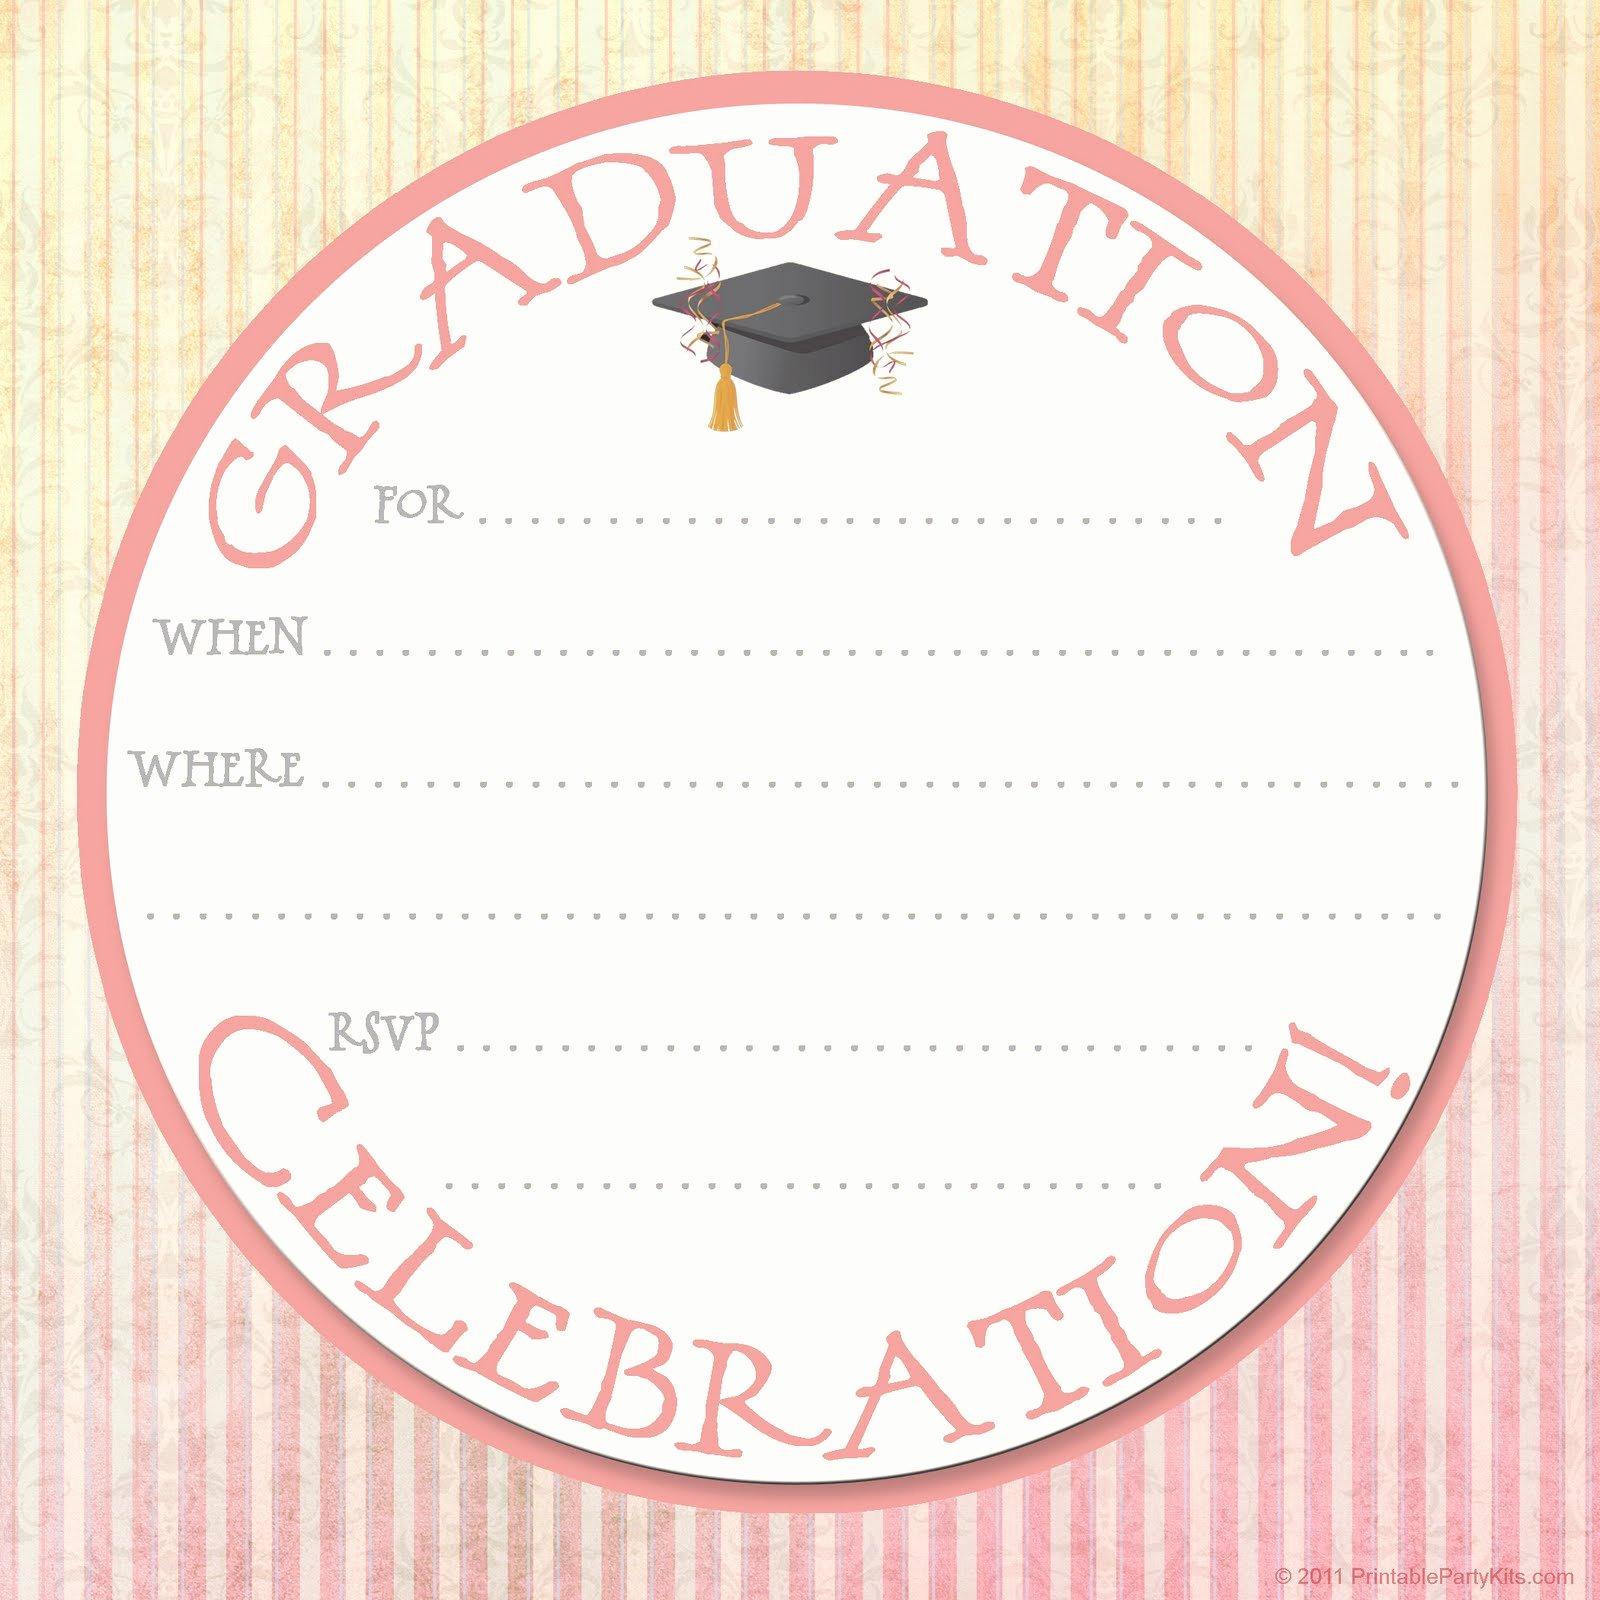 Graduation Party Invitation Template Free Fresh Free Printable Party Invitations Graduation Party